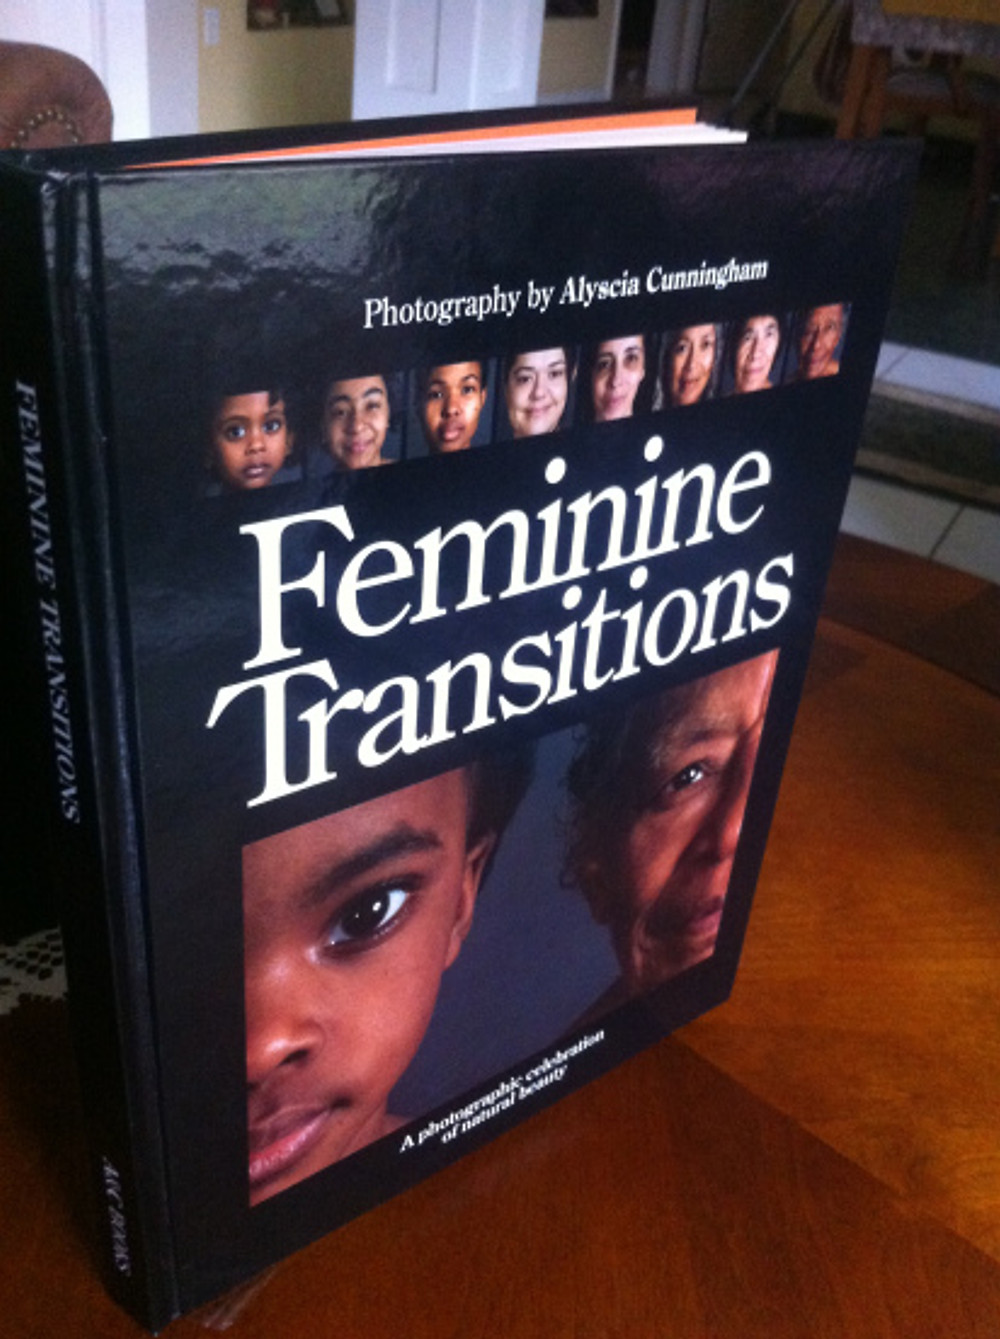 Feminine Transitions hardcover book